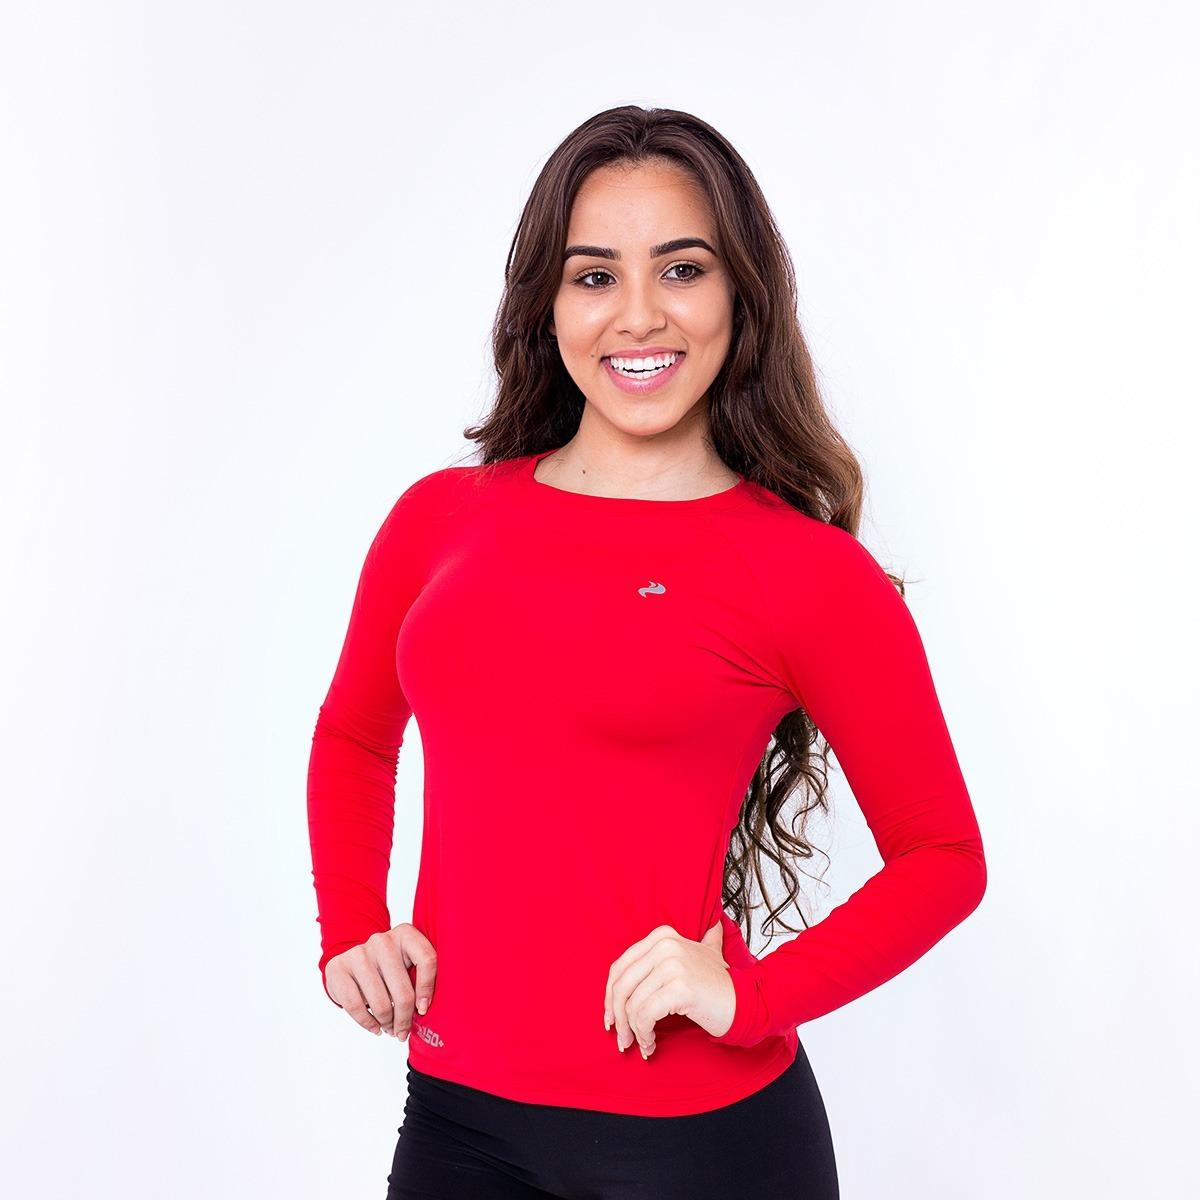 kit 4 camisas feminina proteção uv solar térmica segunda pel. Carregando  zoom. 00550db753f